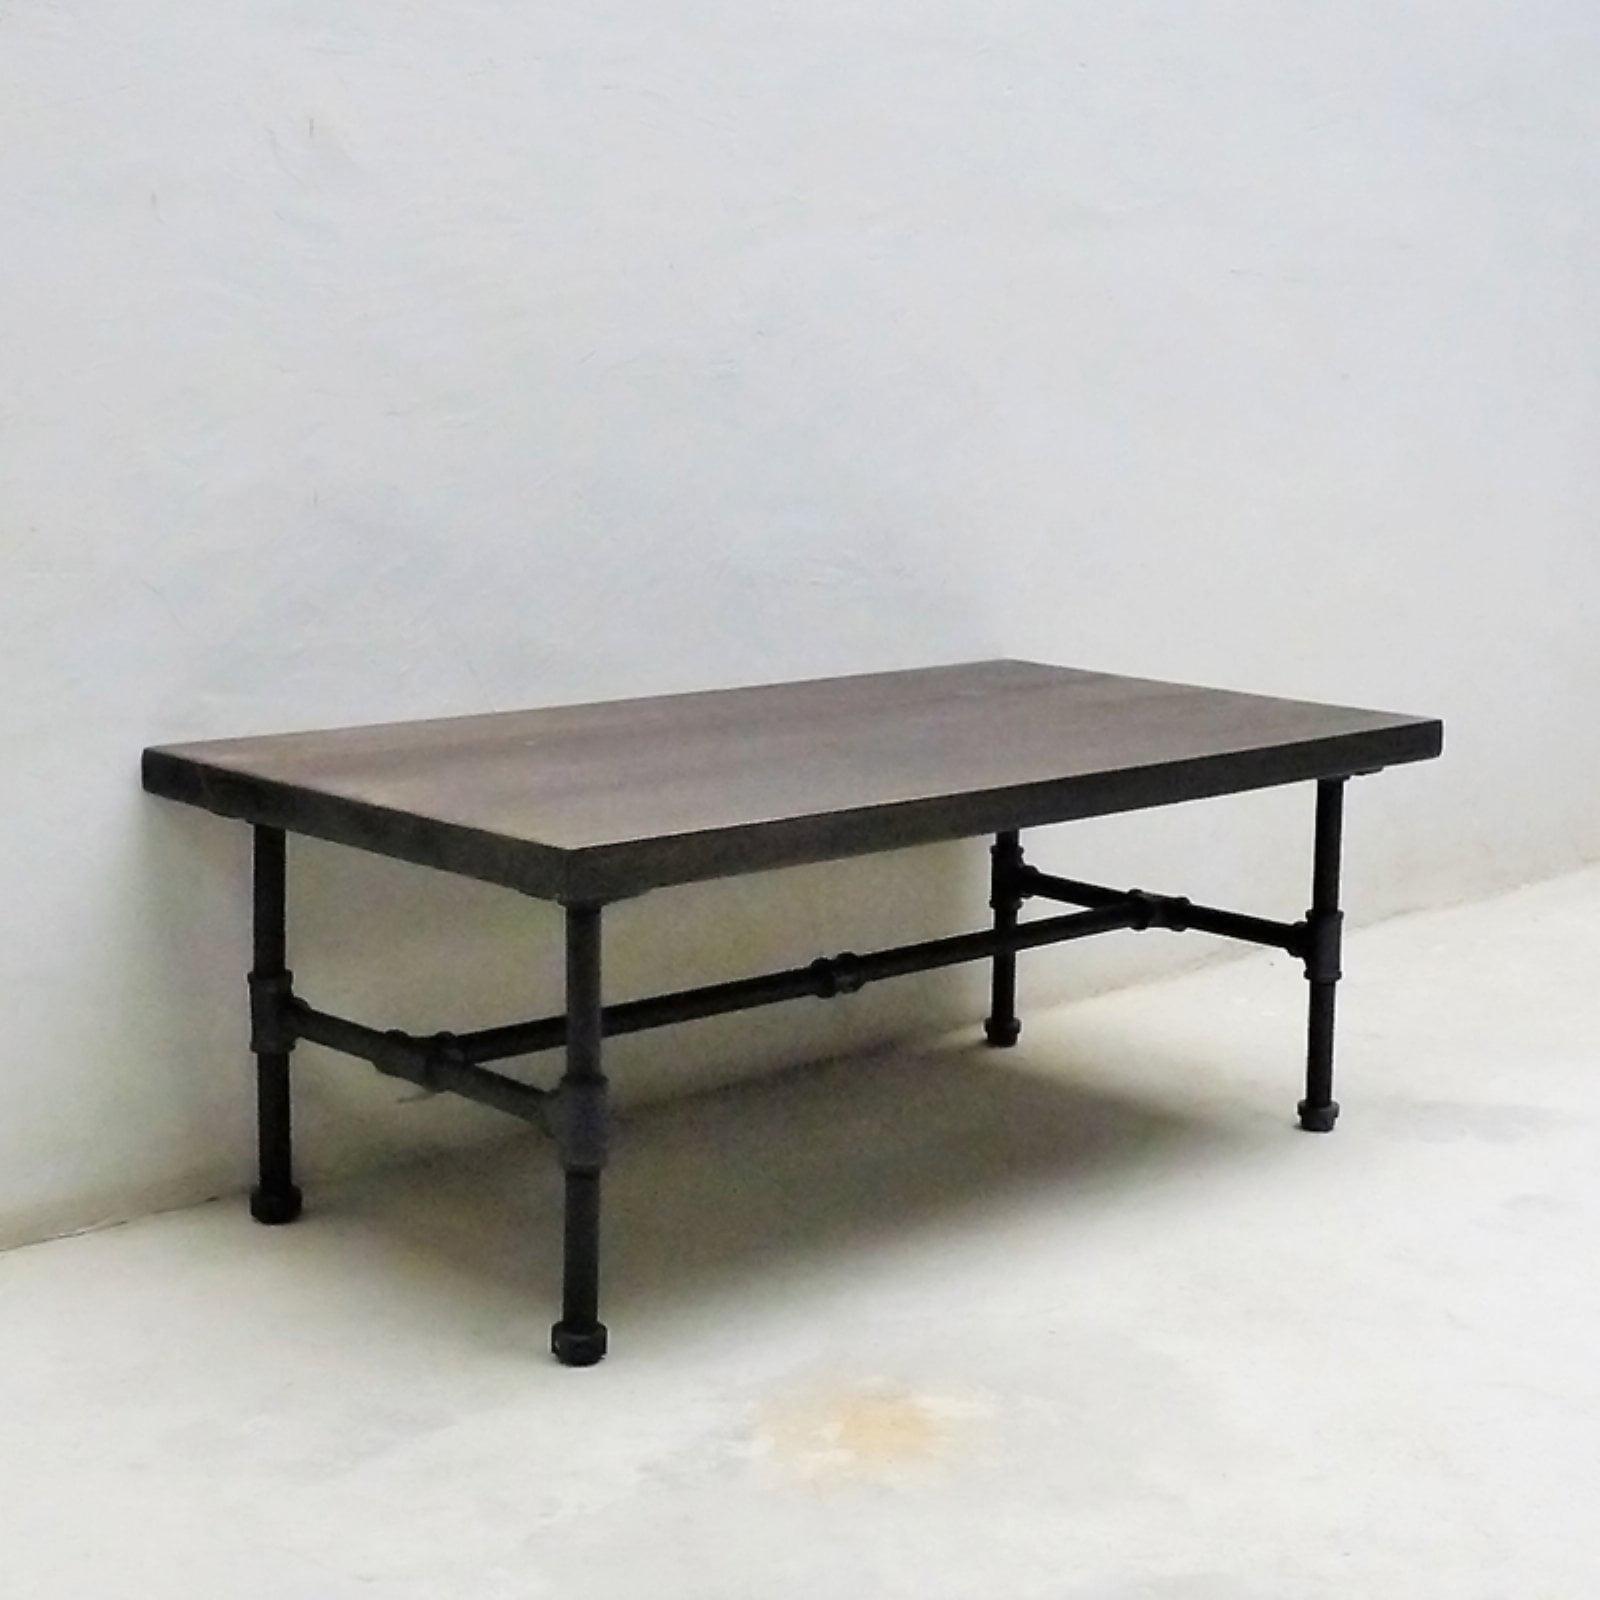 Furniture Pipeline Corvallis Industrial Coffee Table